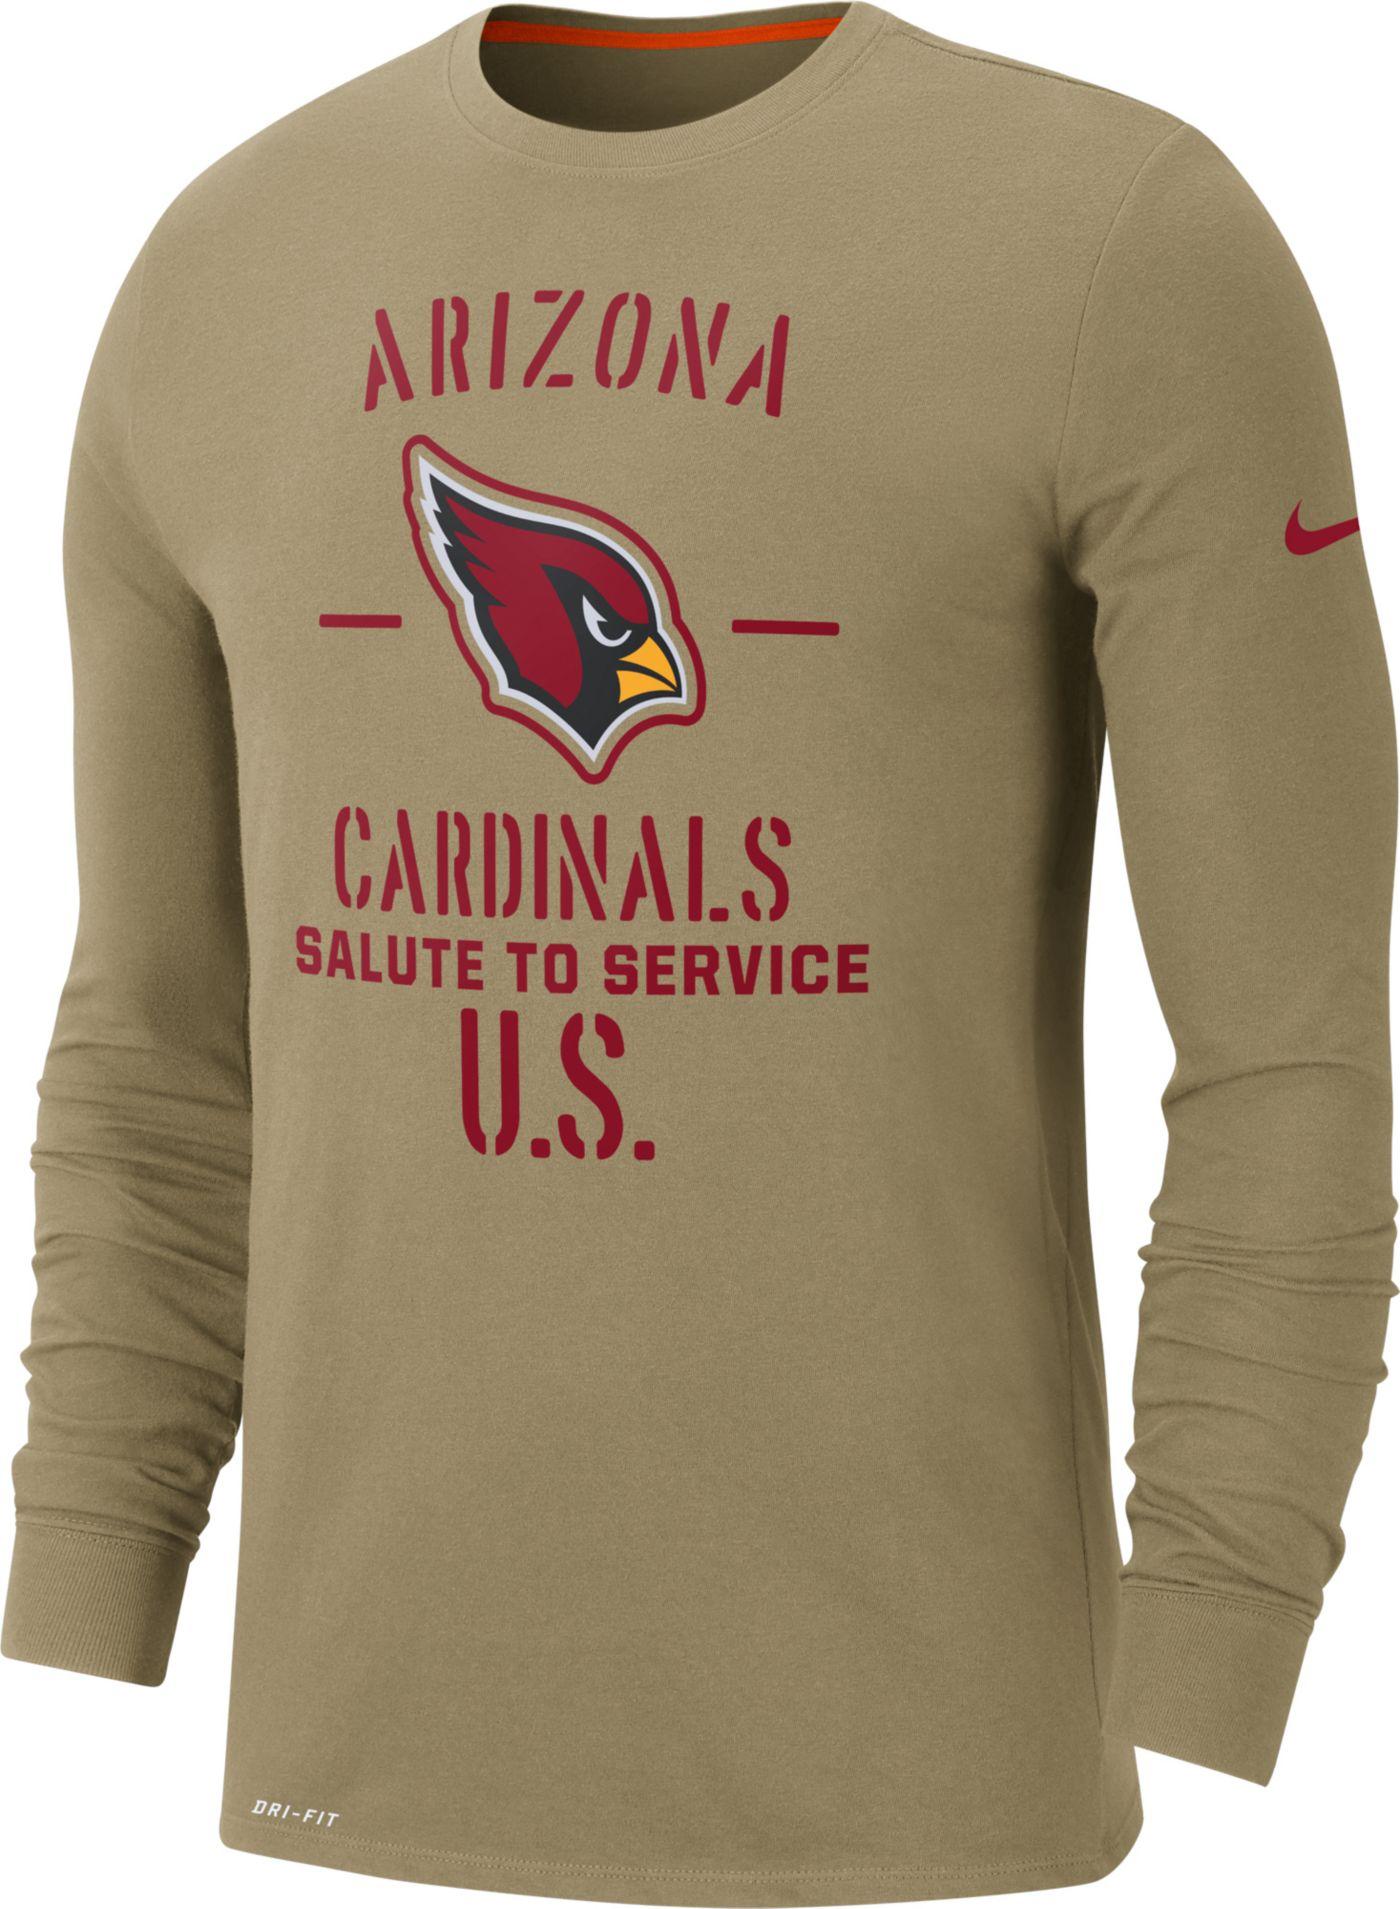 Nike Men's Salute to Service Arizona Cardinals Dri-FIT Beige Long Sleeve Shirt